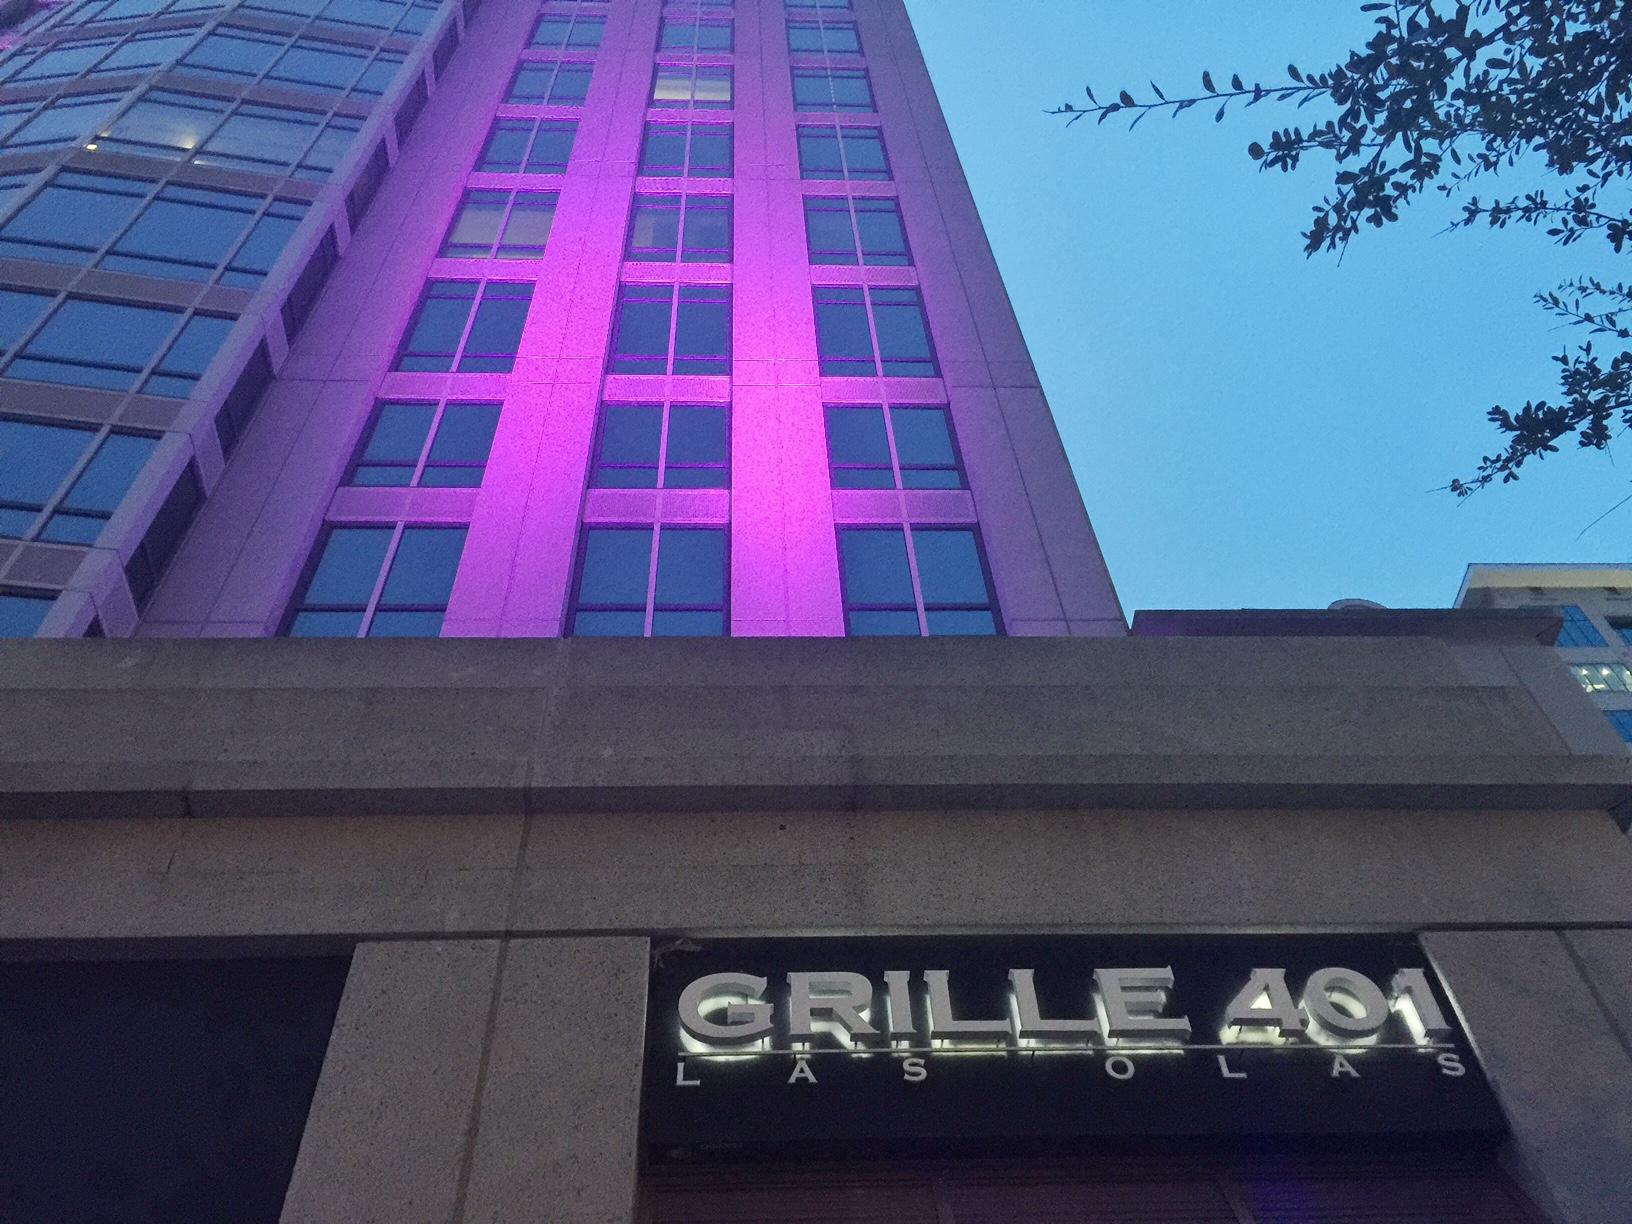 Grille 401 Fort Lauderdale | Grille-401 | Mandy Carter | Acupful.com | Fort Lauderdale restaurants Las Olas Blvd Dining | Ft Lauderdale eats | Florida vacation | Florida food blogger